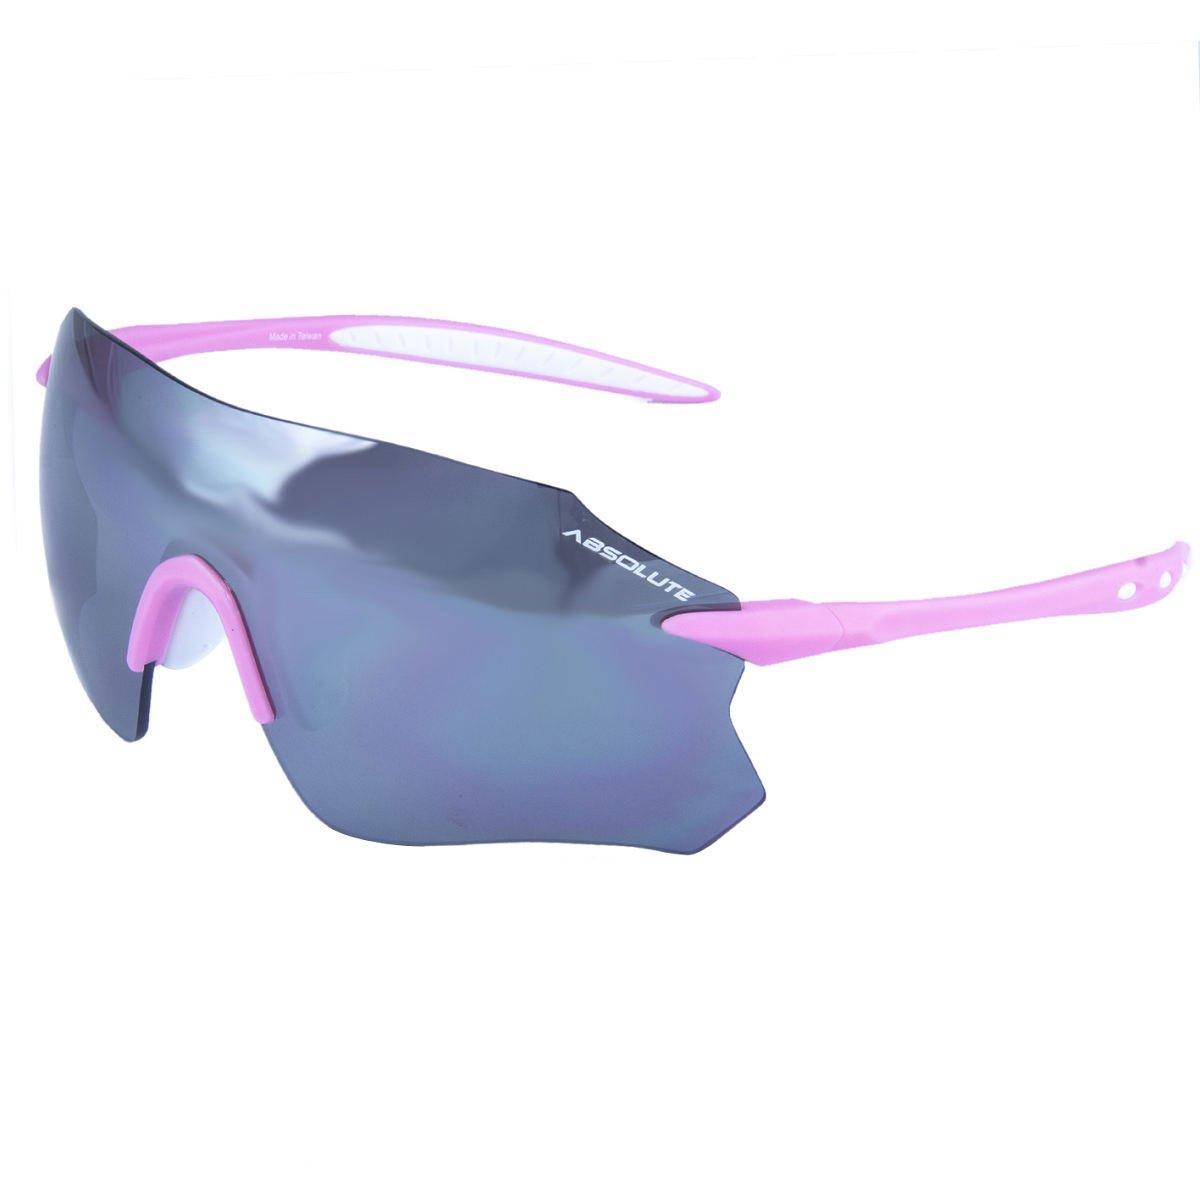 Oculos Ciclismo Absolute Prime SL Branco Rosa Lente Polarizado